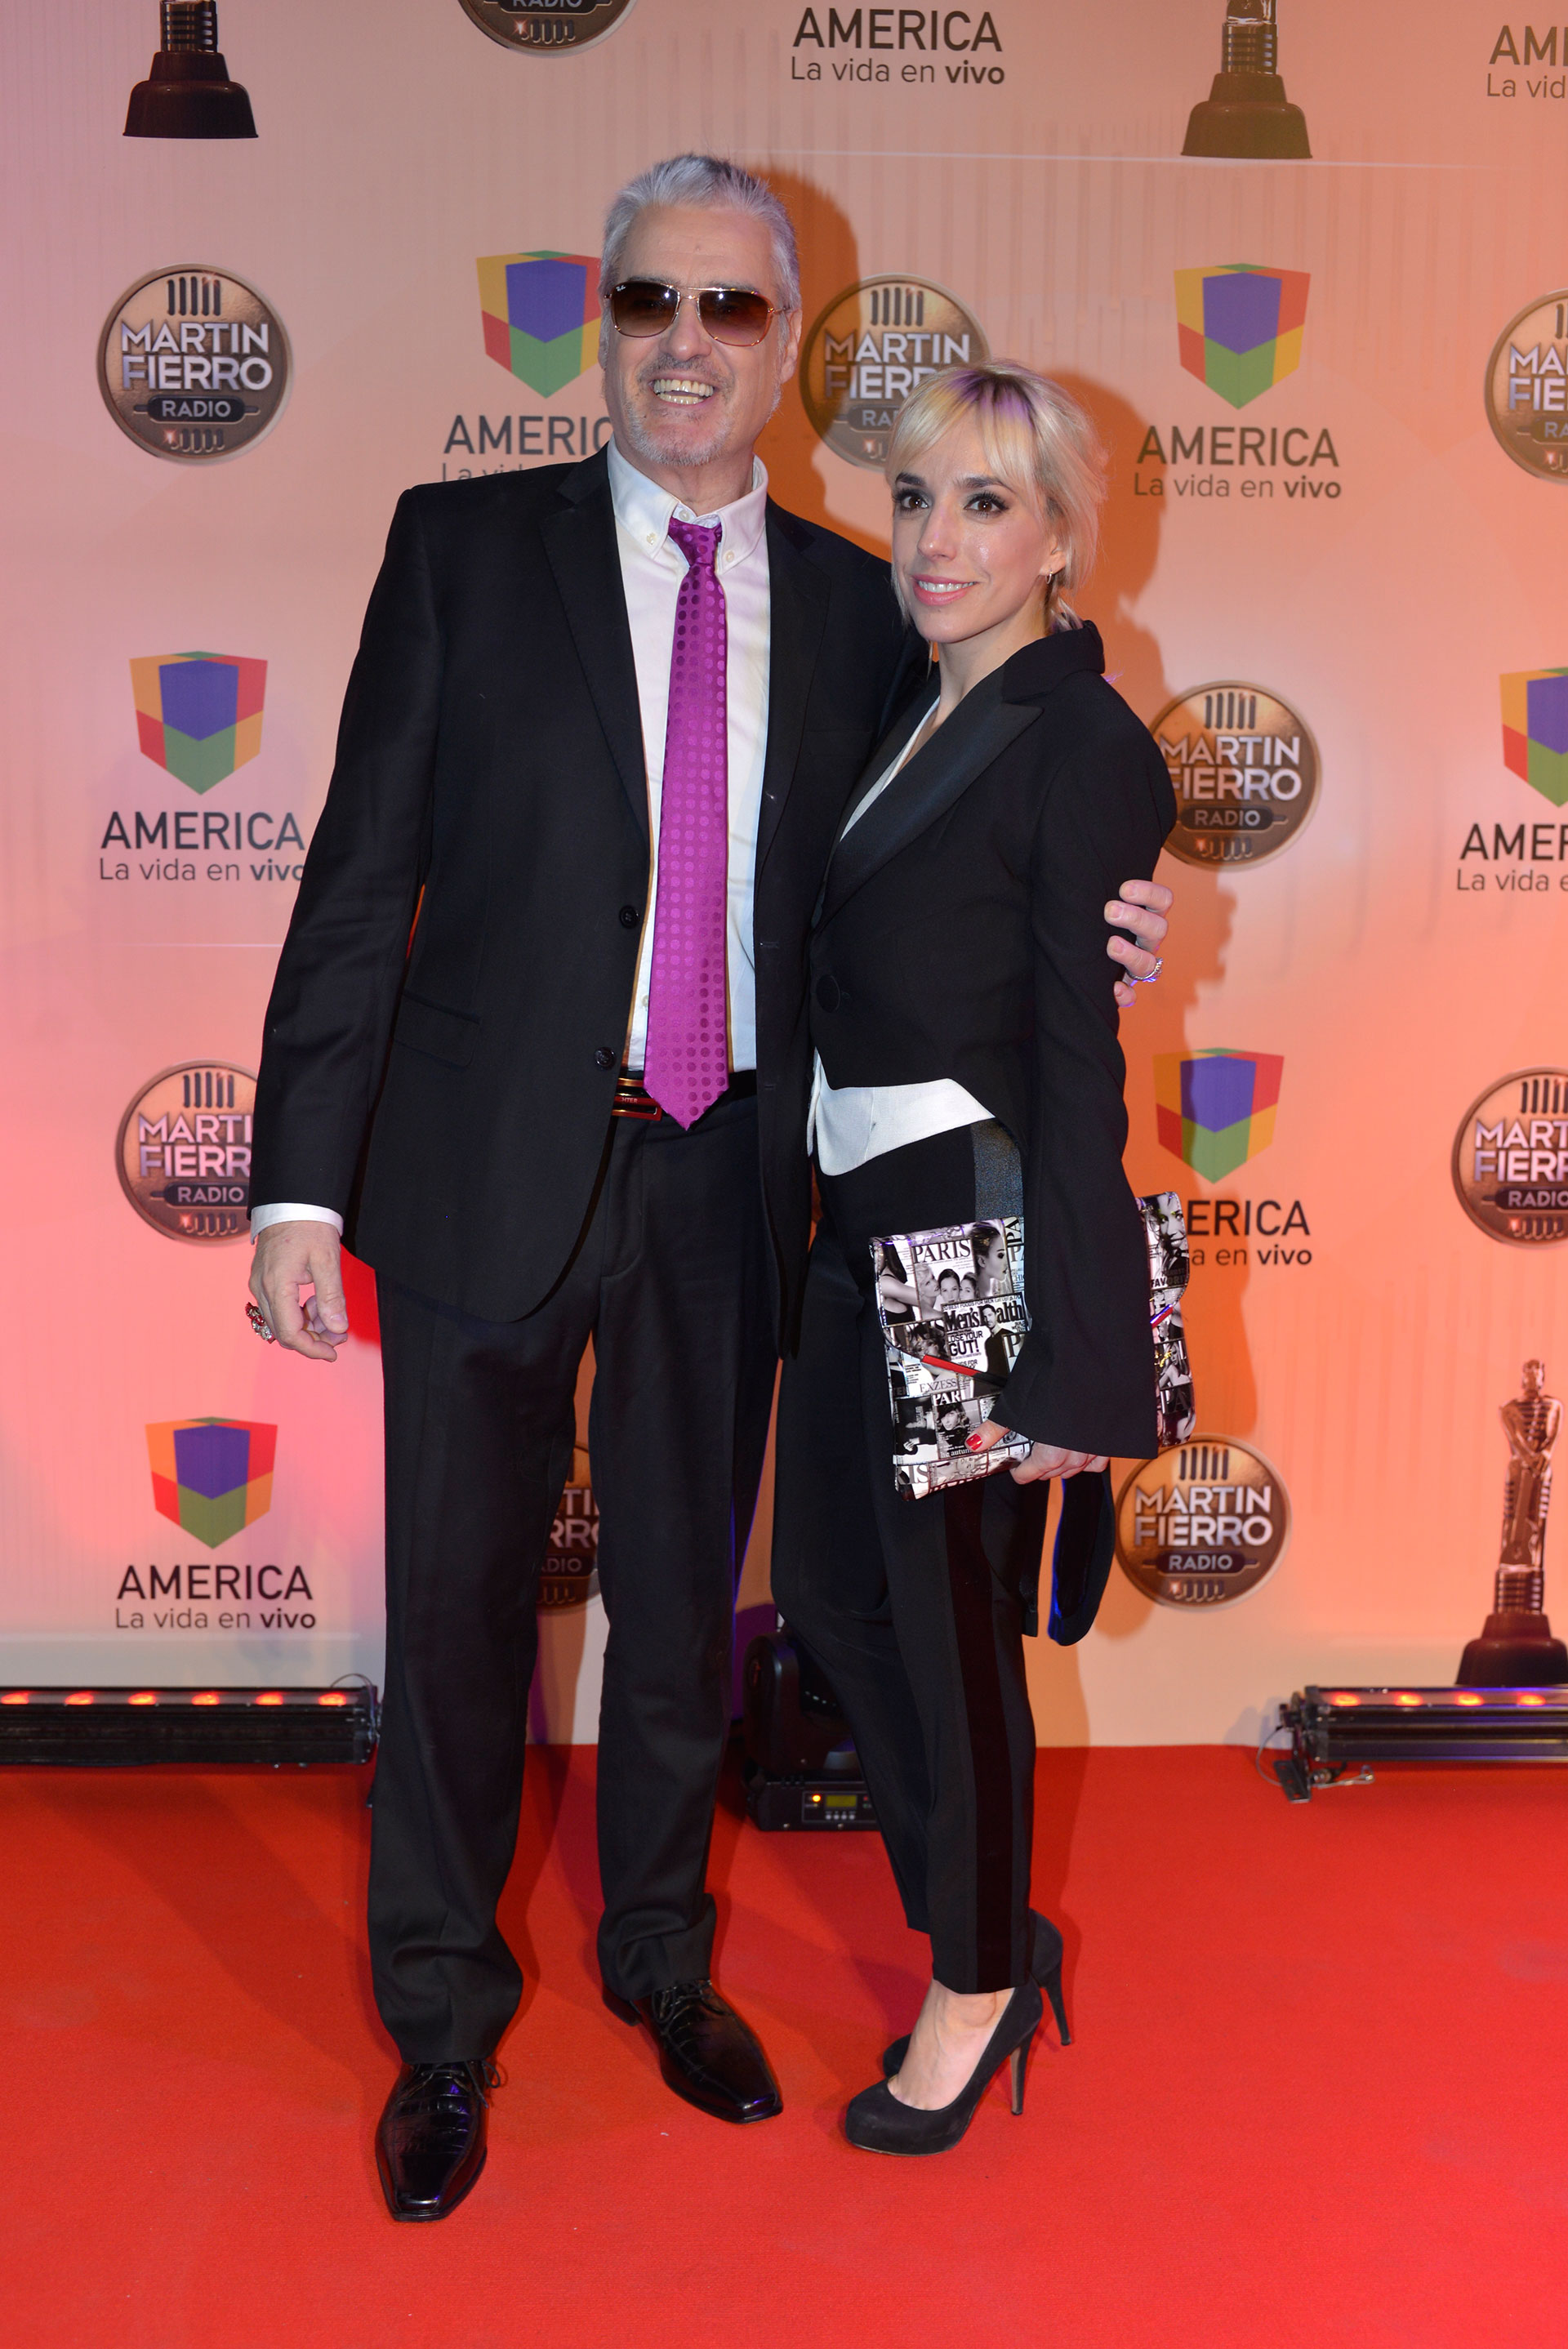 Roberto y Tamara Pettinato. Padre e hija disfrutaron de la noche.